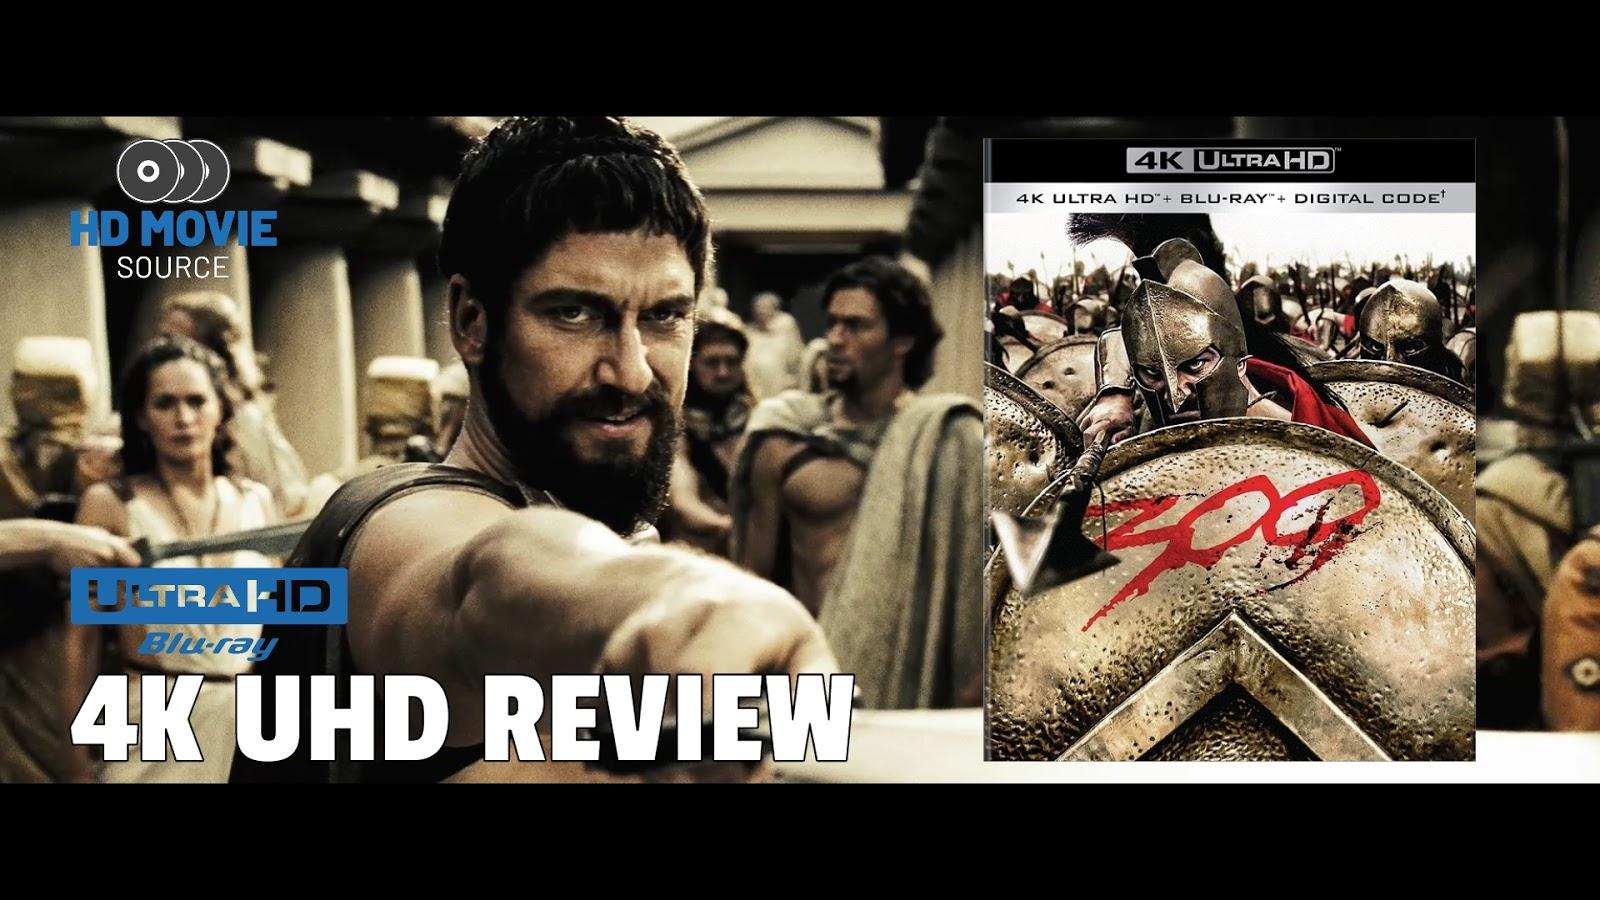 300 2007 4k Ultra Hd Blu Ray Review The Basics